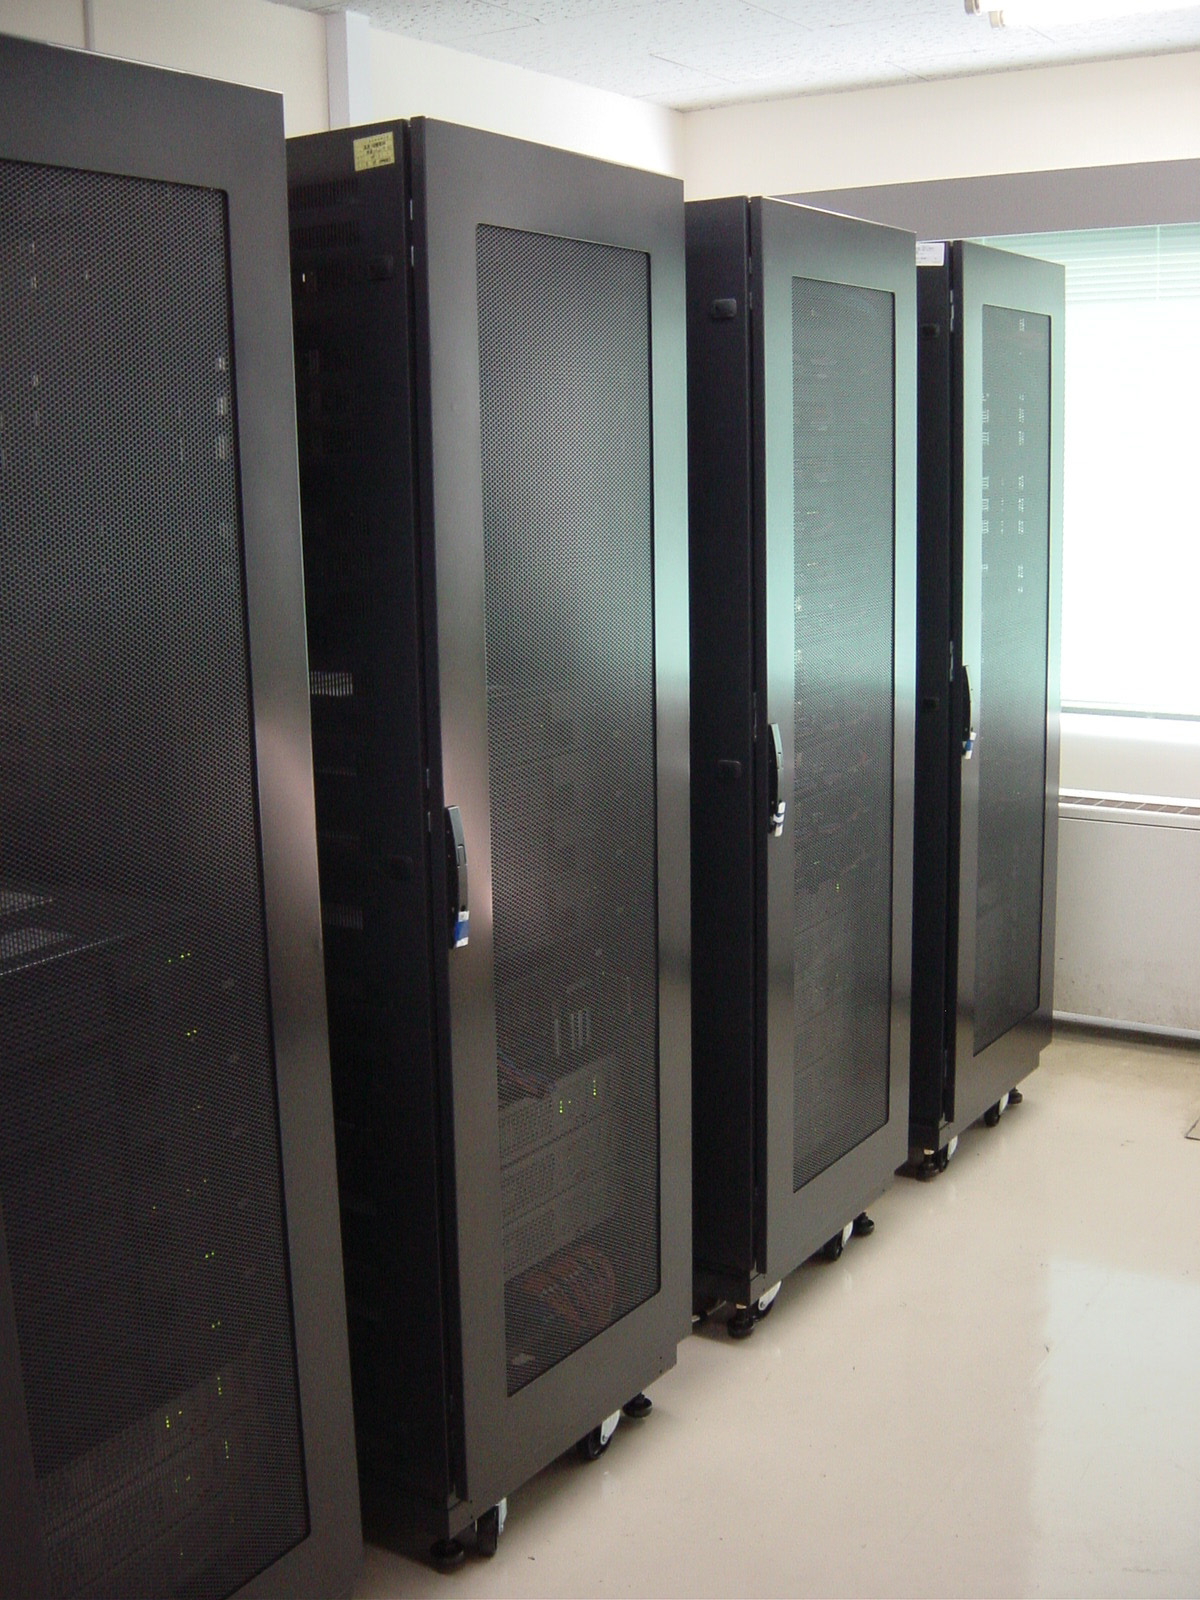 Comp-server.jpg